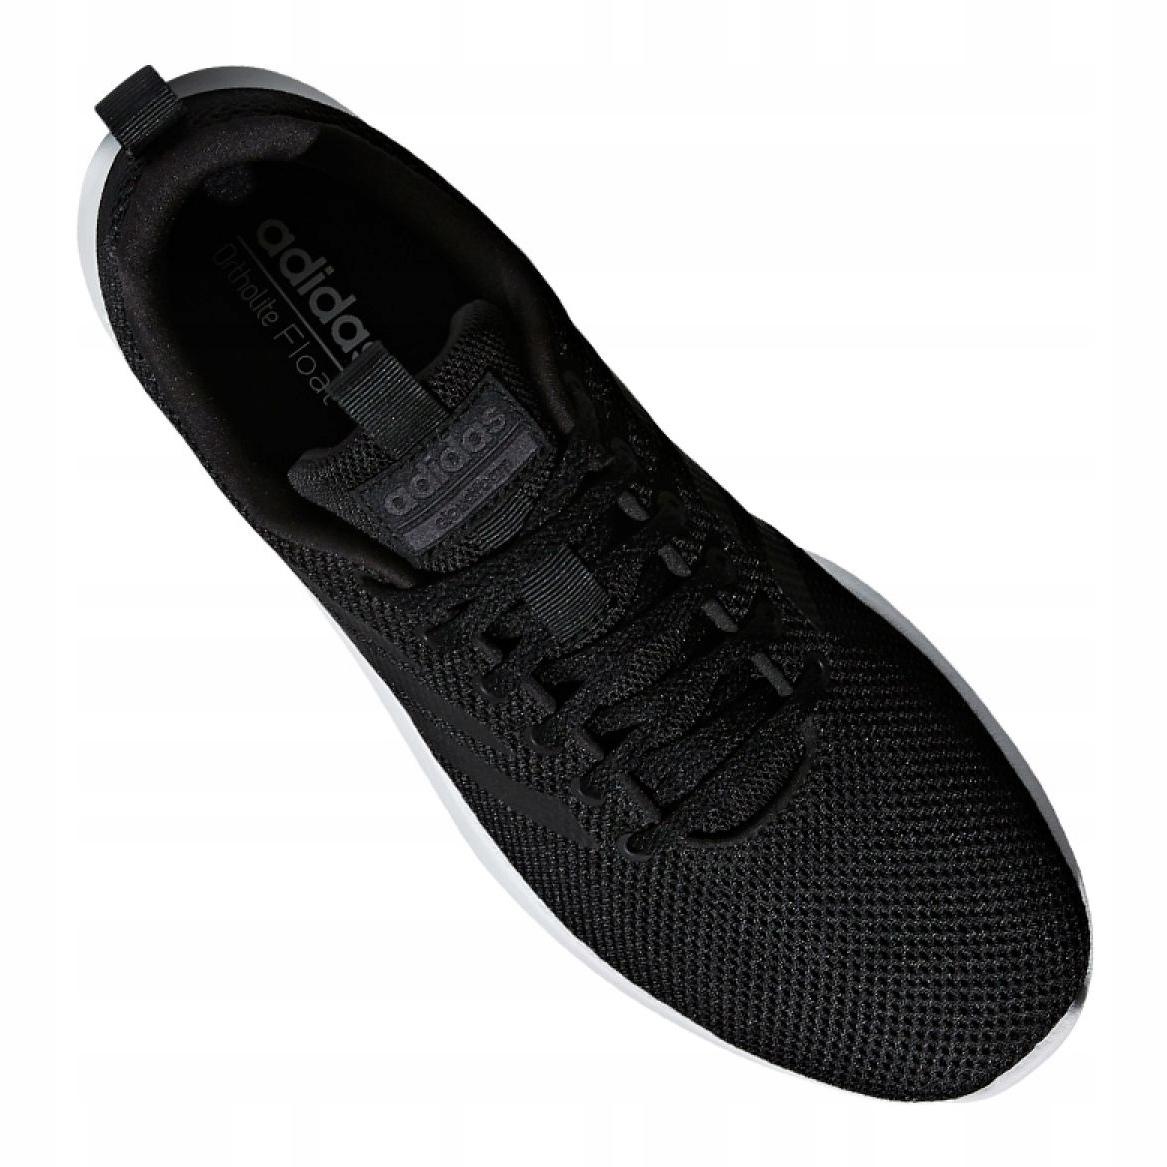 Nero Scarpe Adidas Lite Racer Cln M B96569